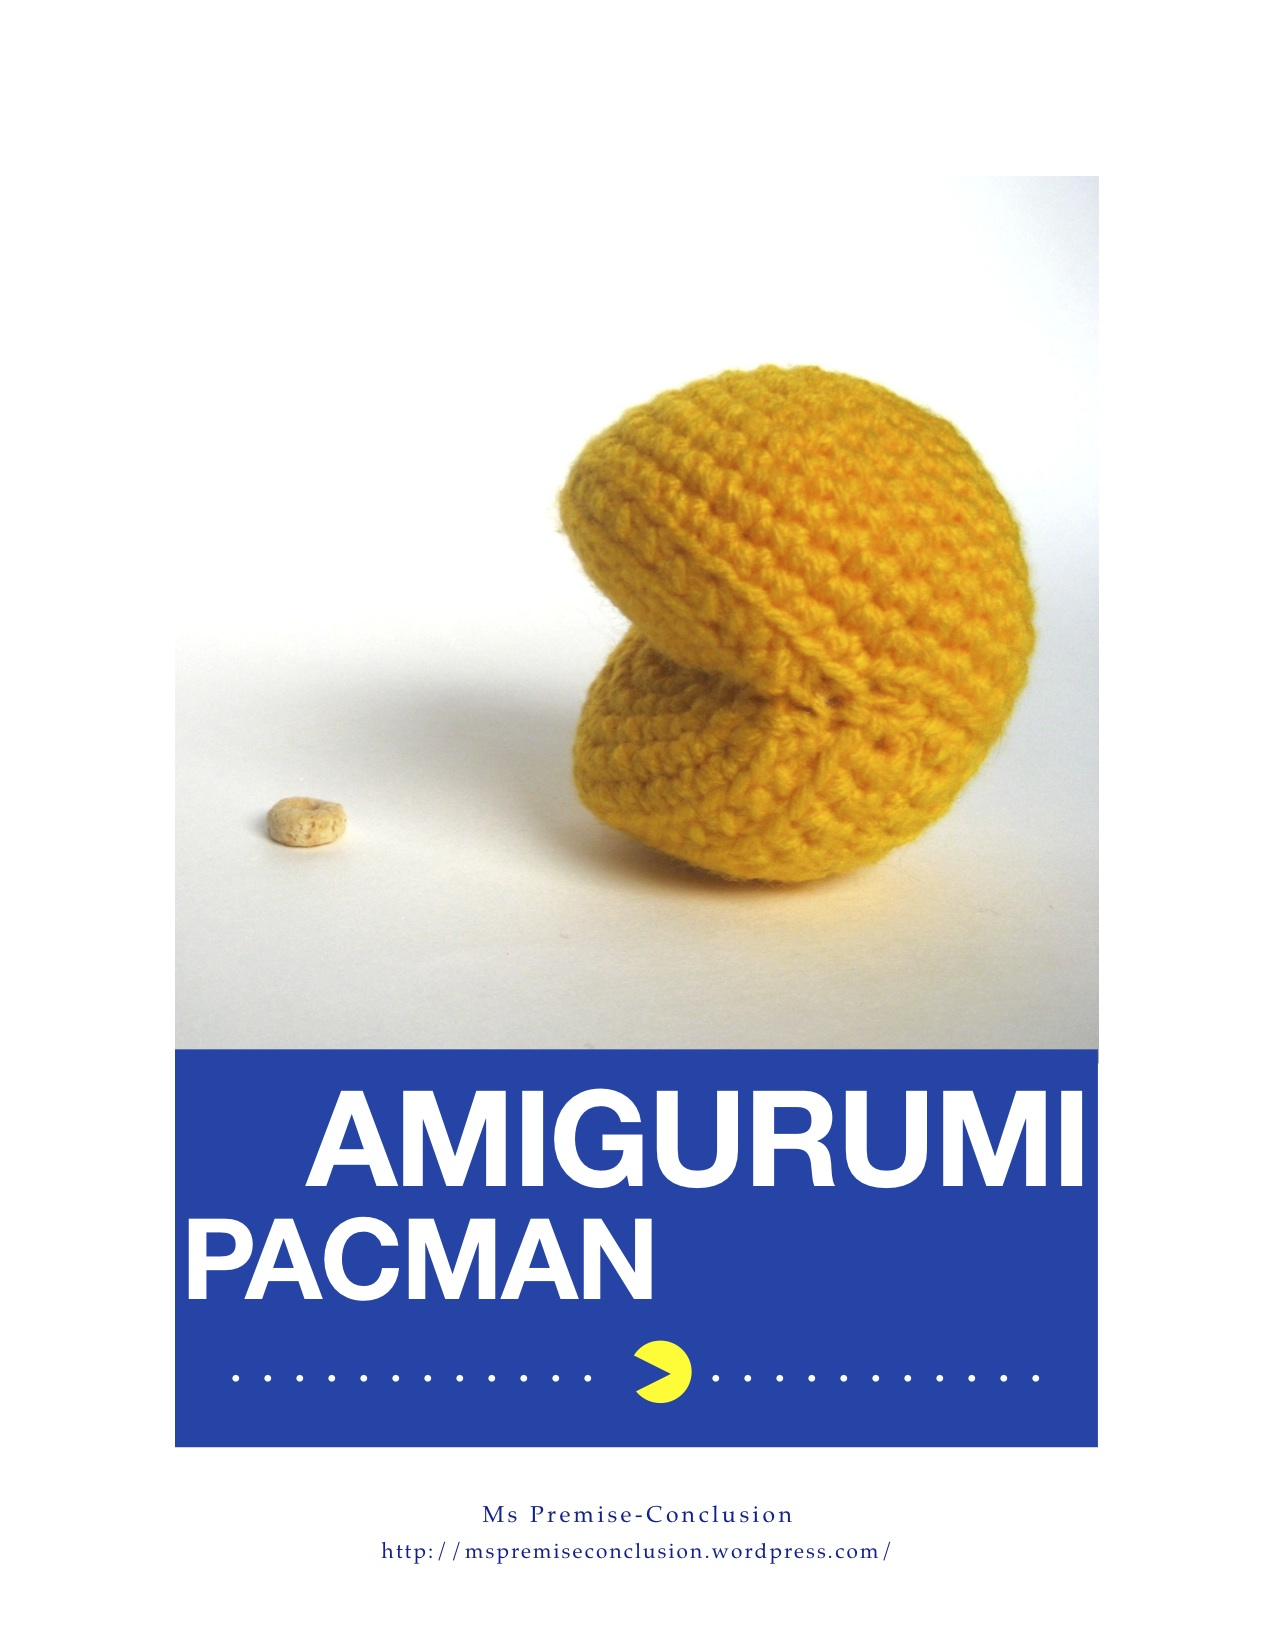 Amigurumi Patterns Wordpress : Pacman Pattern Time Ms Premise-Conclusion